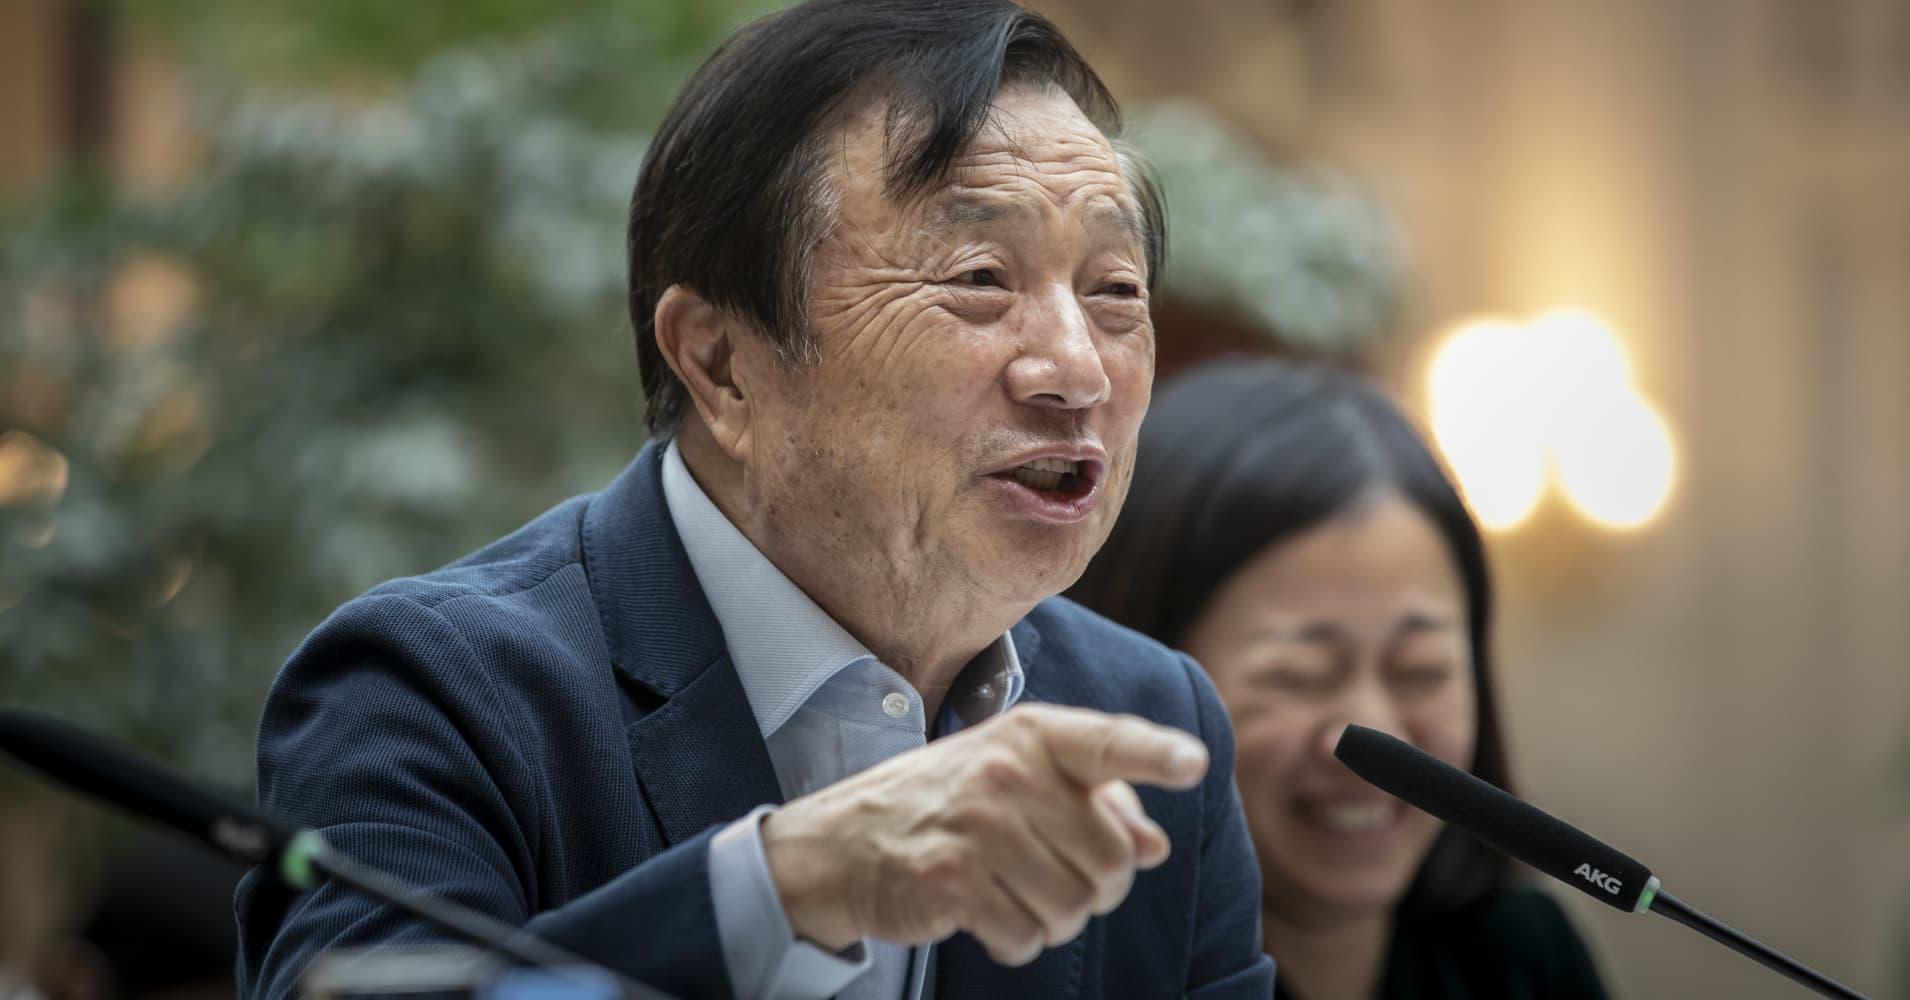 Huawei founder Ren Zhengfei says arrest of CFO Meng Wanzhou is politically motivated